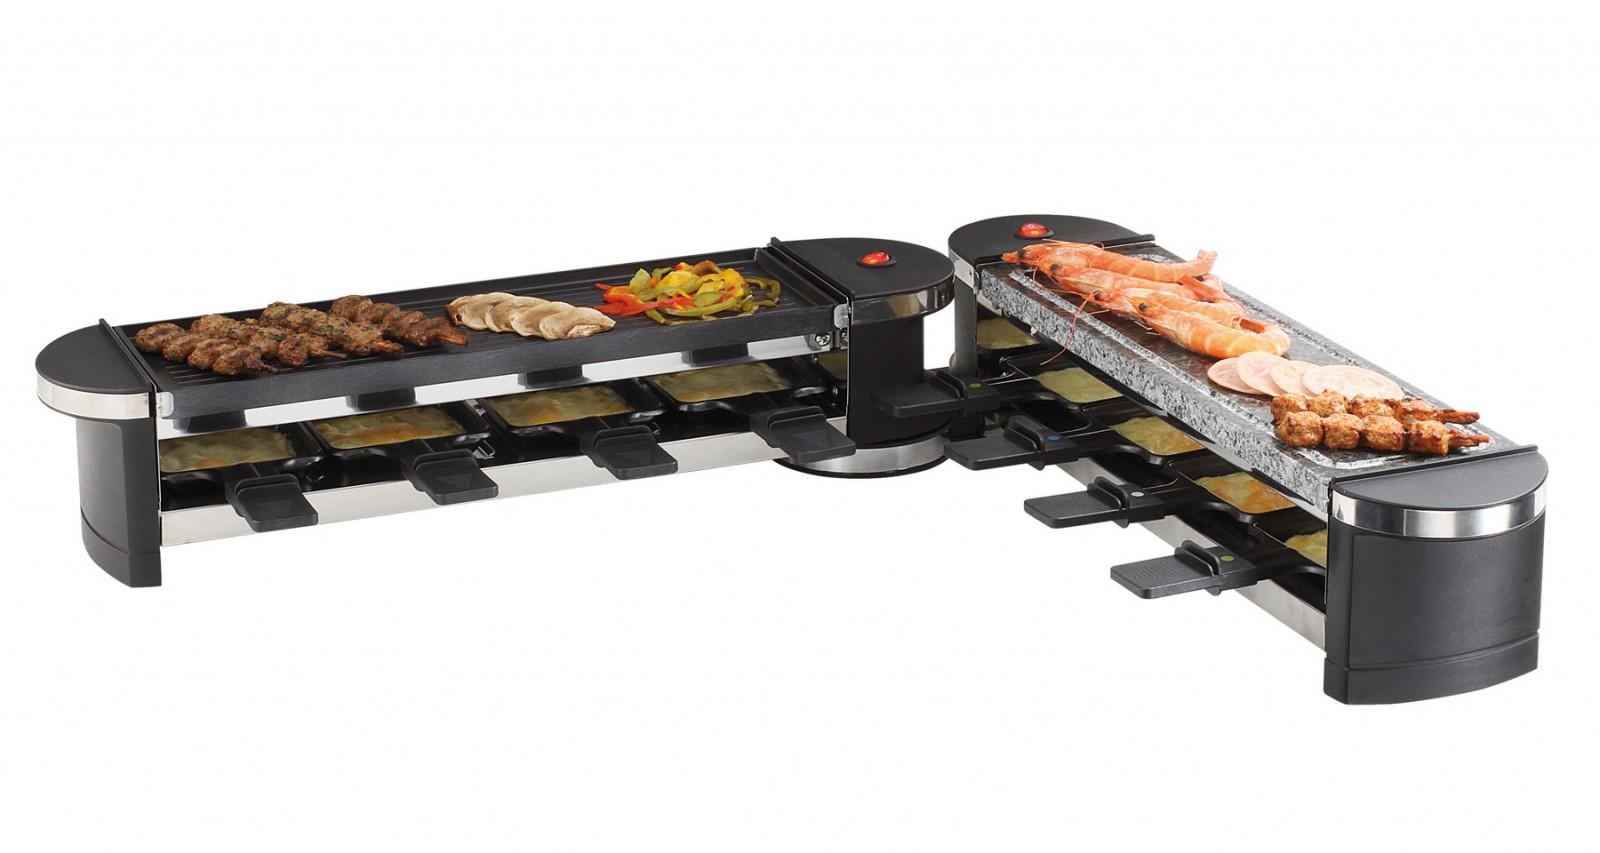 raclette hei er stein domoclip doc160 ausklappbar raclette ger t 8 pfannen grill ebay. Black Bedroom Furniture Sets. Home Design Ideas